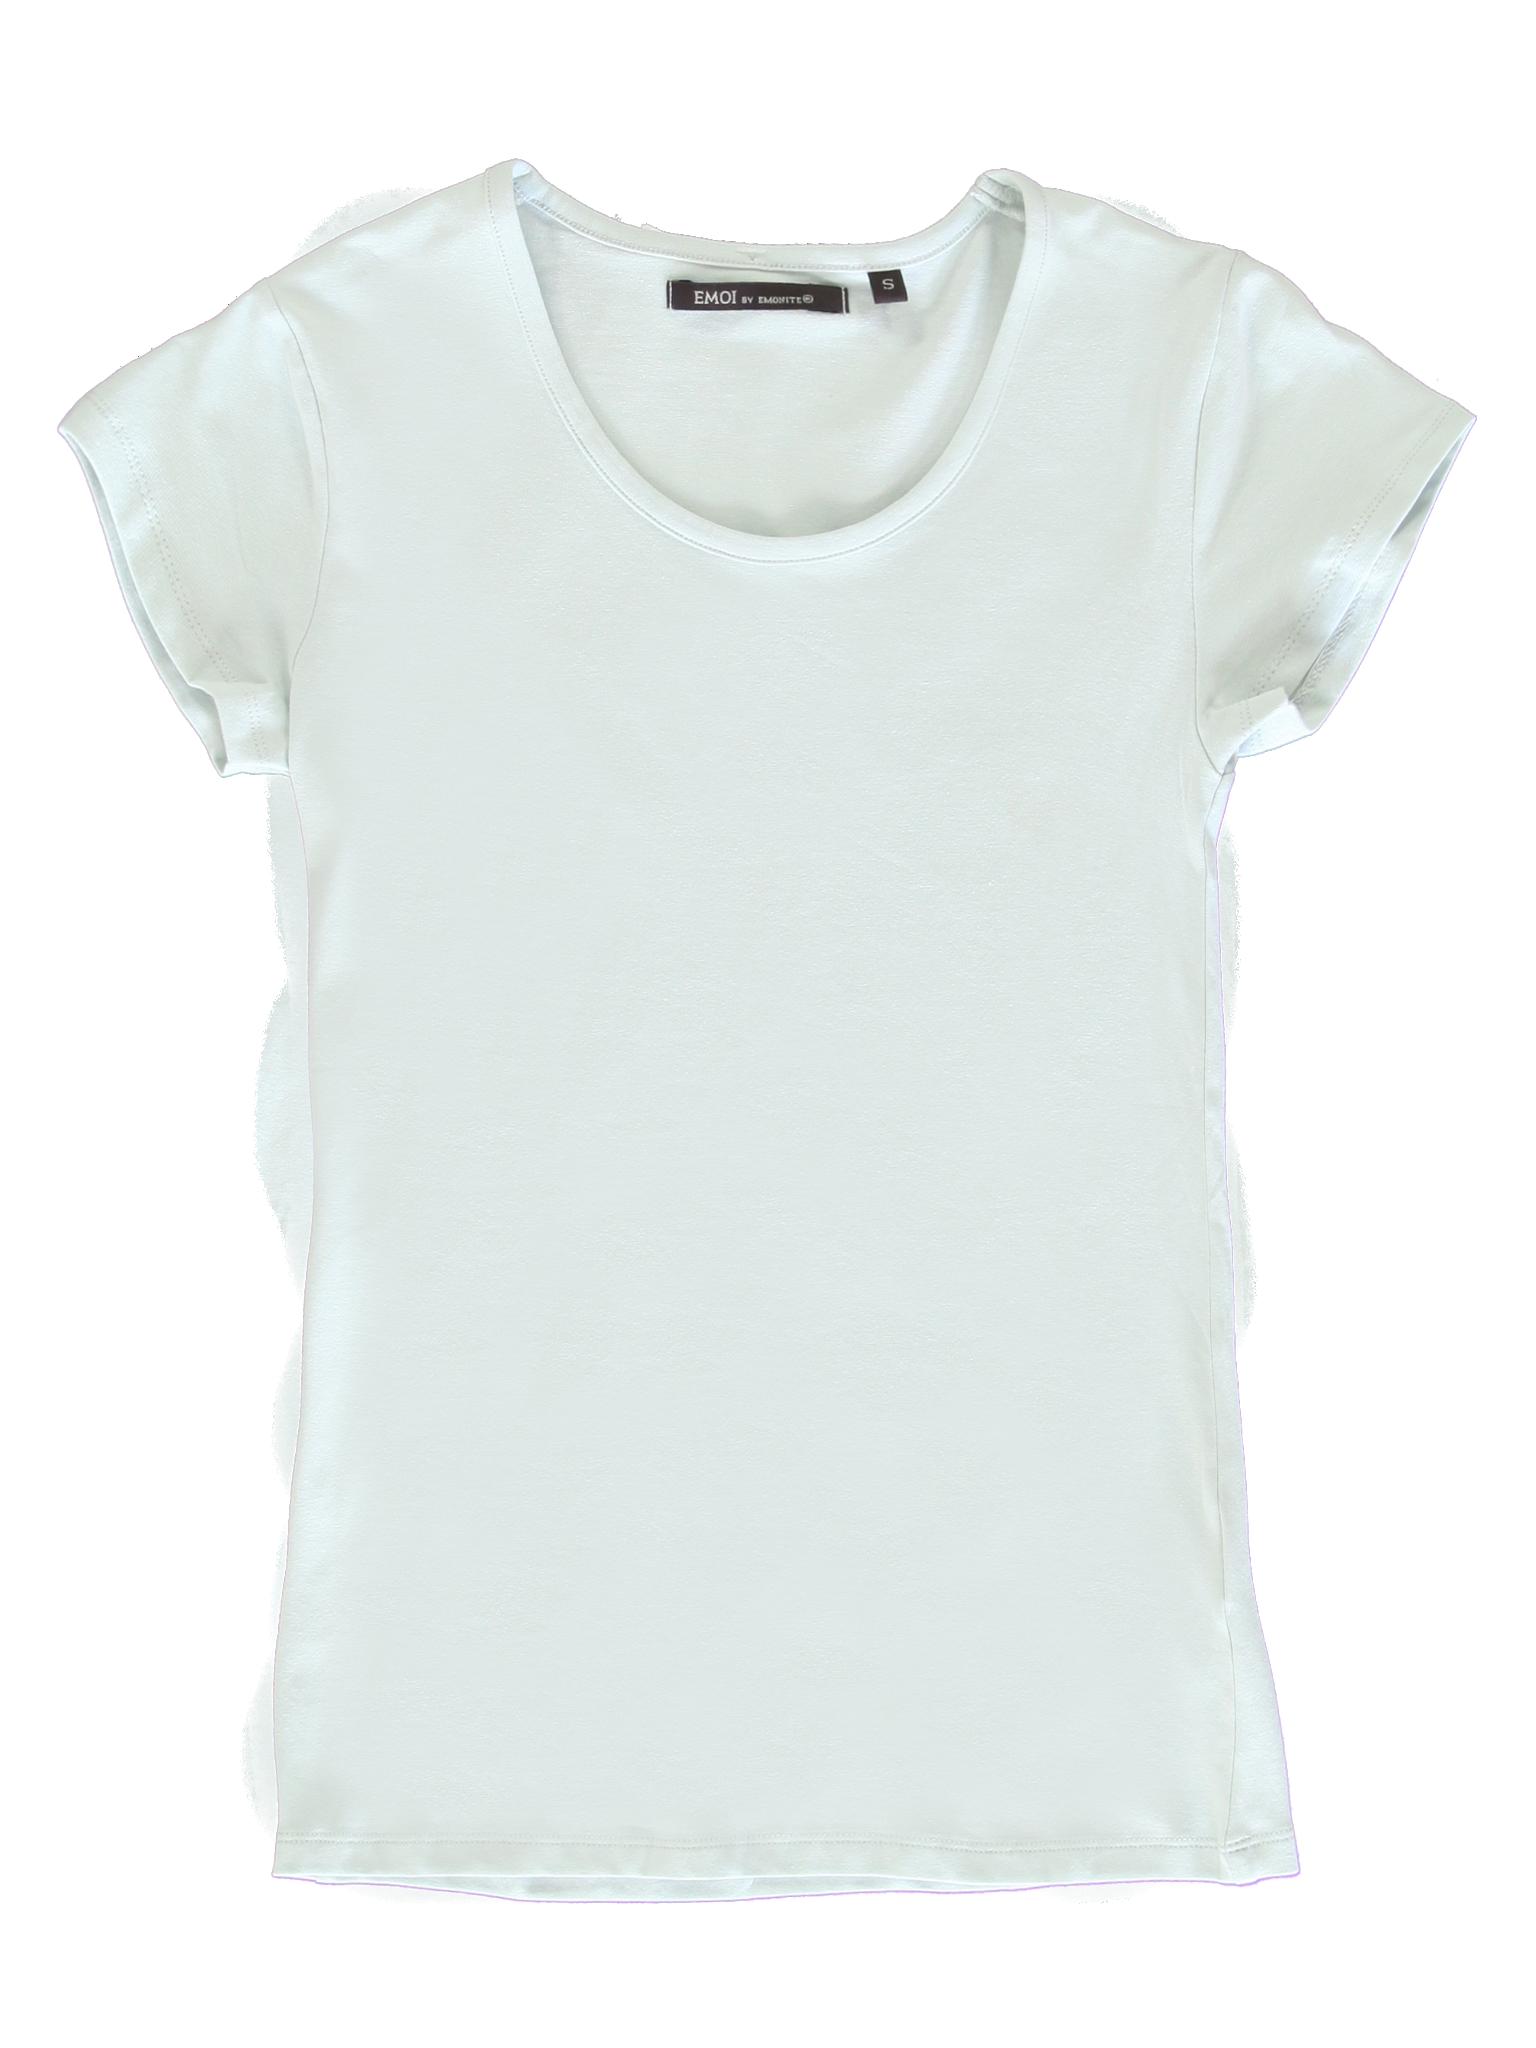 All Brands | Summerproducts Ladies | T-shirt | 30 pcs/box